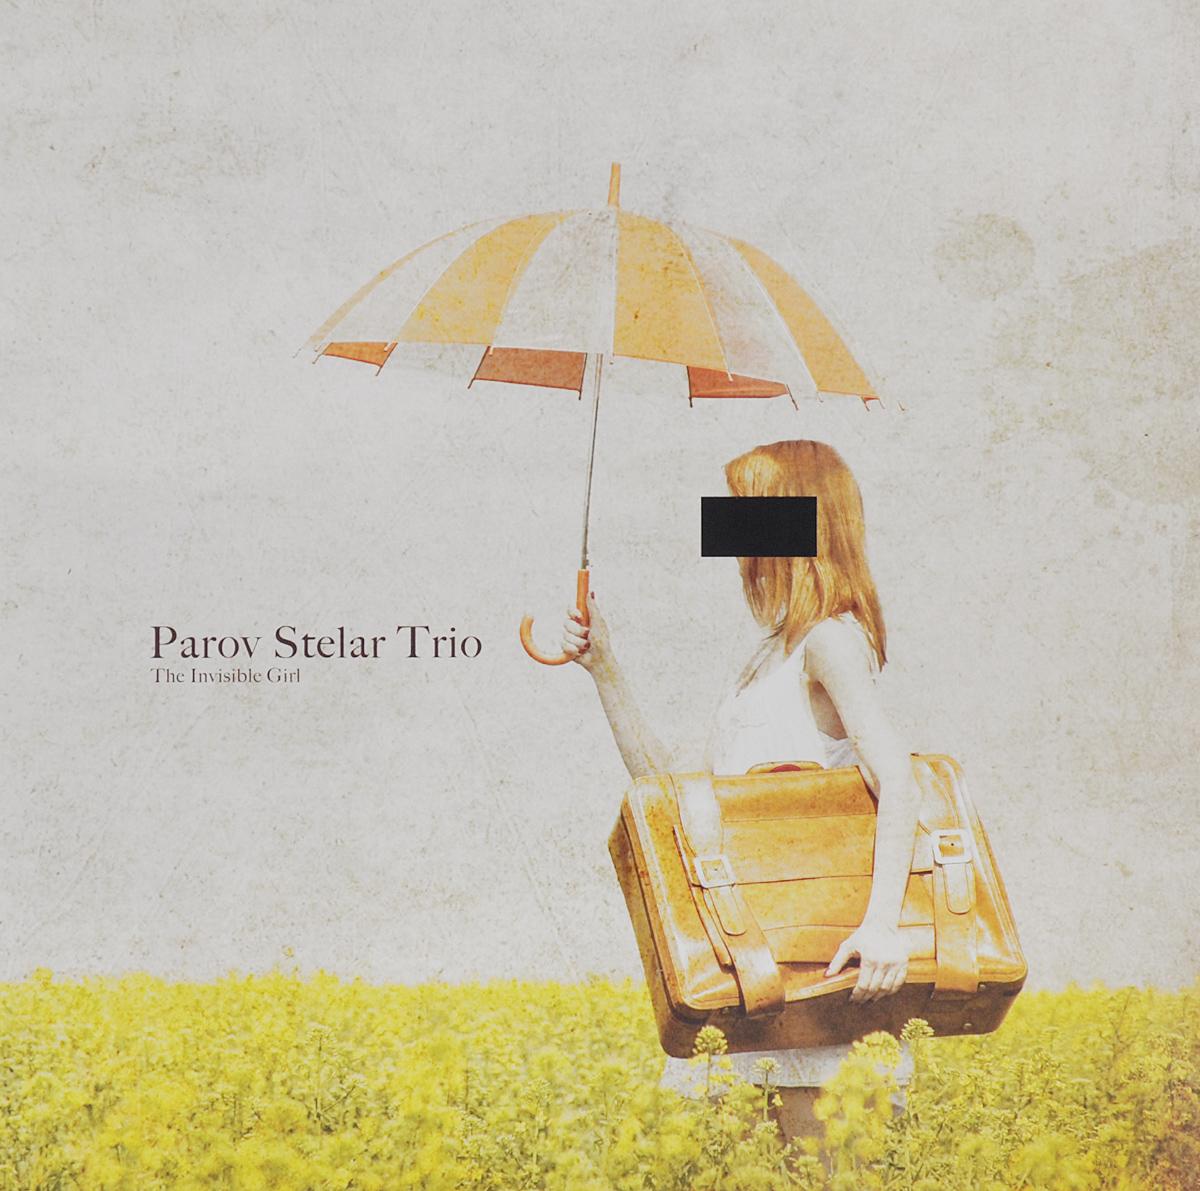 Parov Stelar Trio. The Invisible Girl (LP)